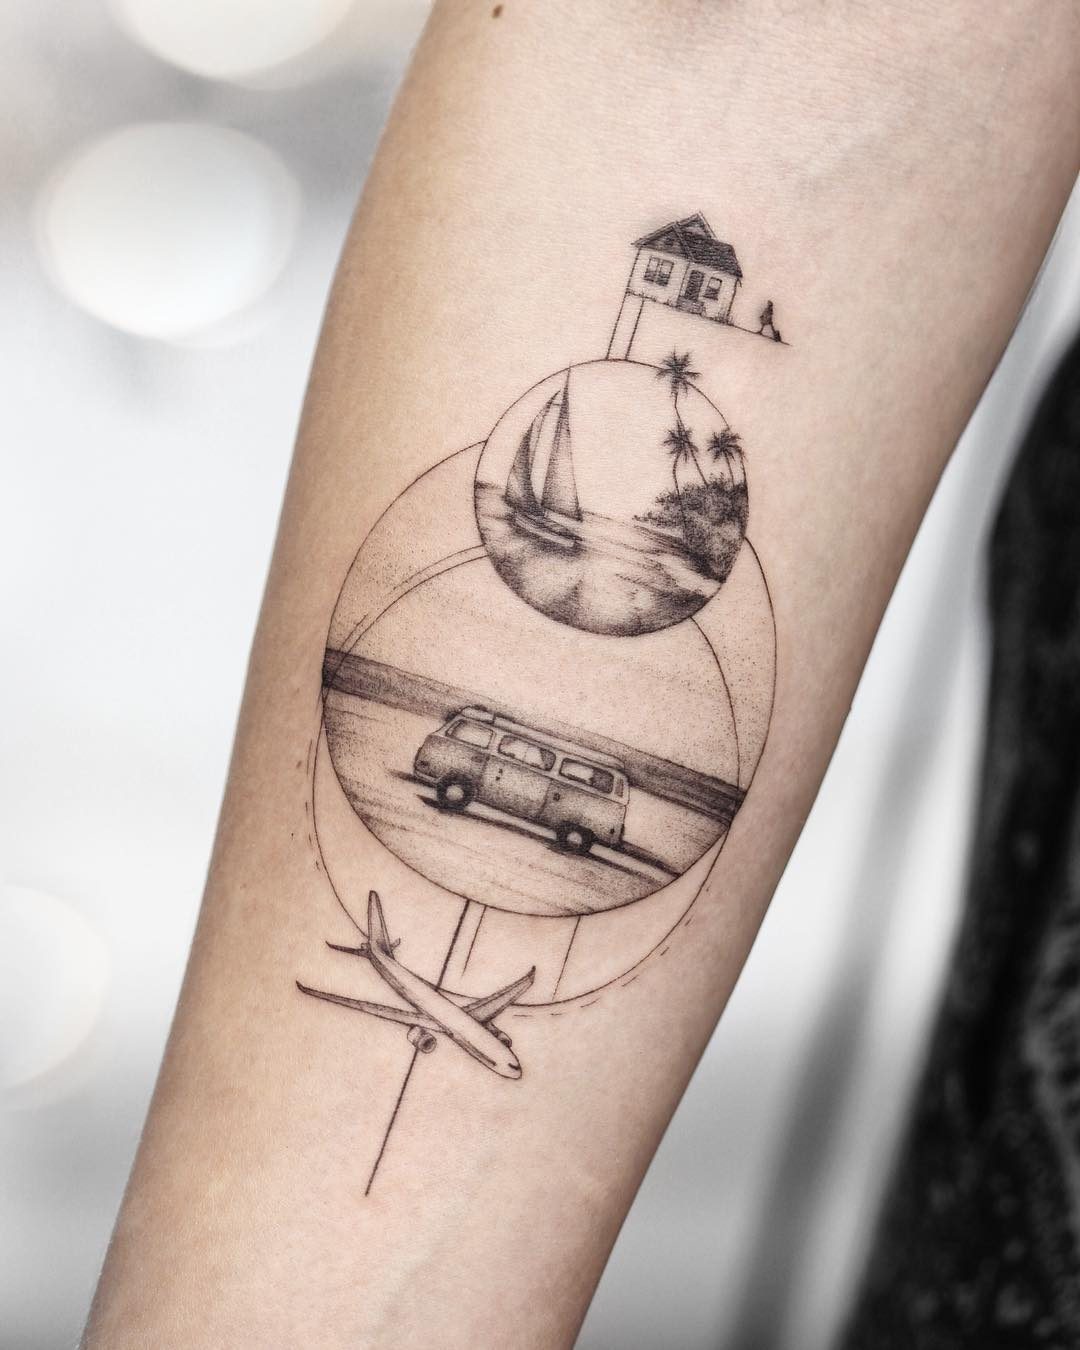 tattoo aereoplano by @mrtnv